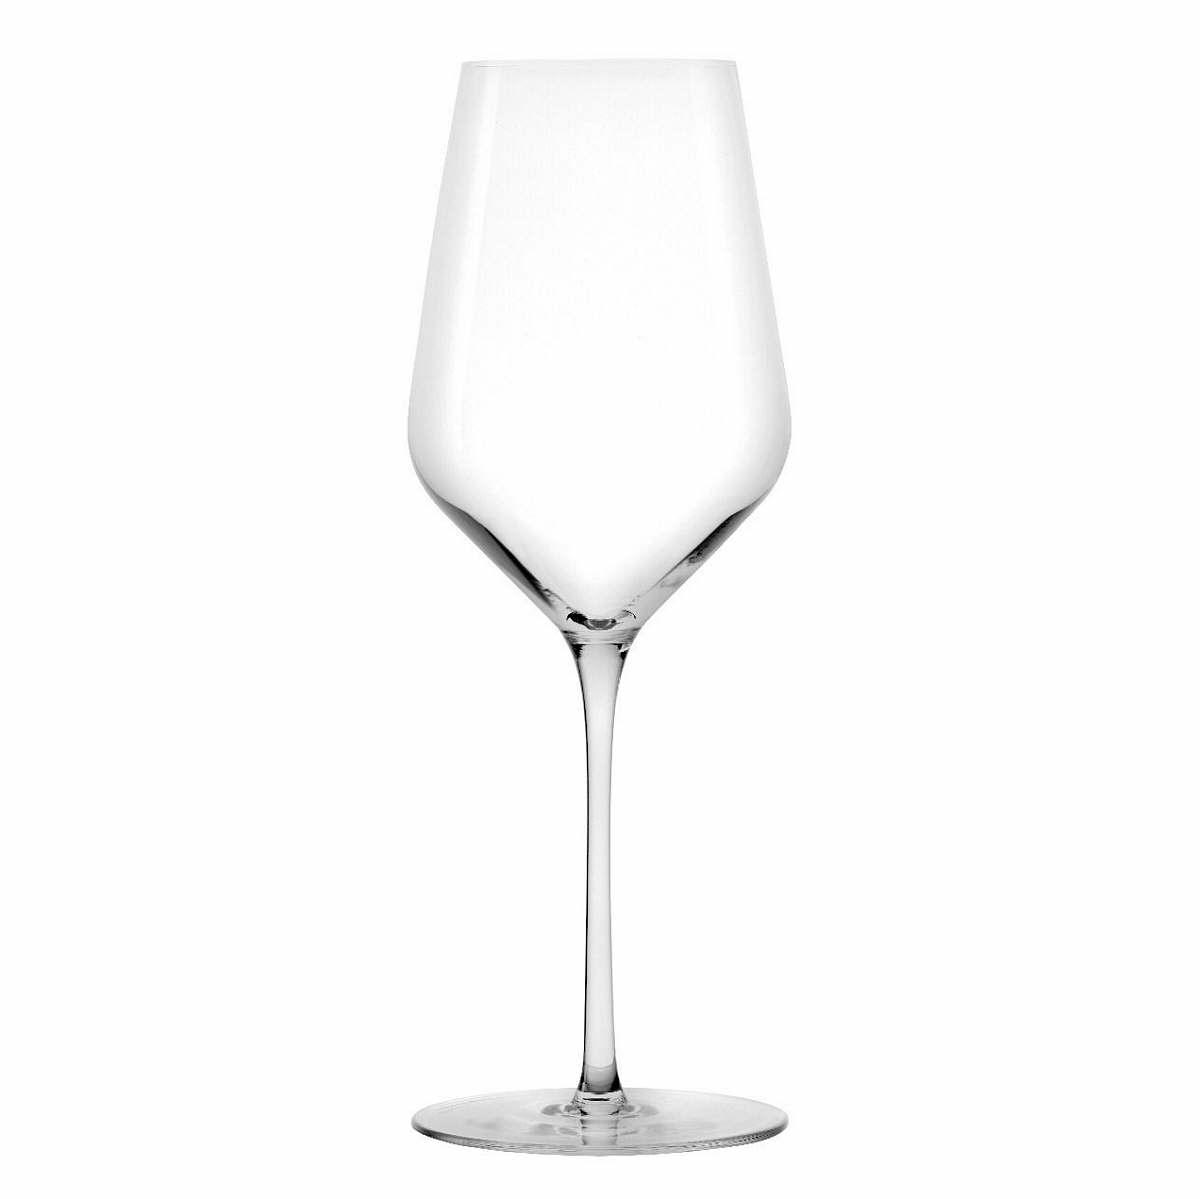 Stölzle STARlight White wine glass